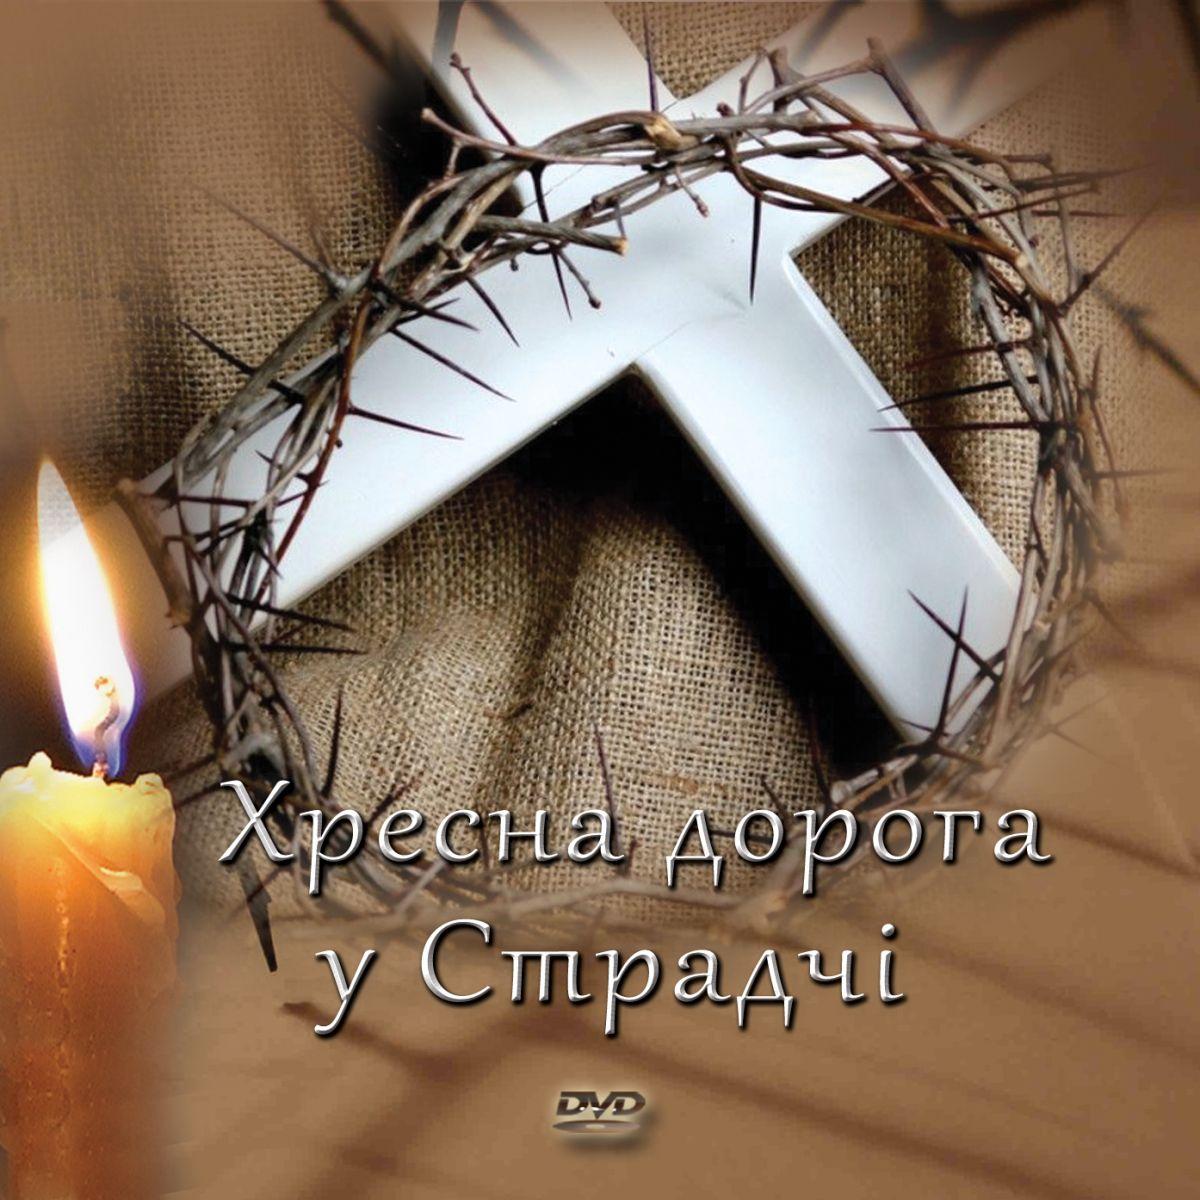 DVD1 1